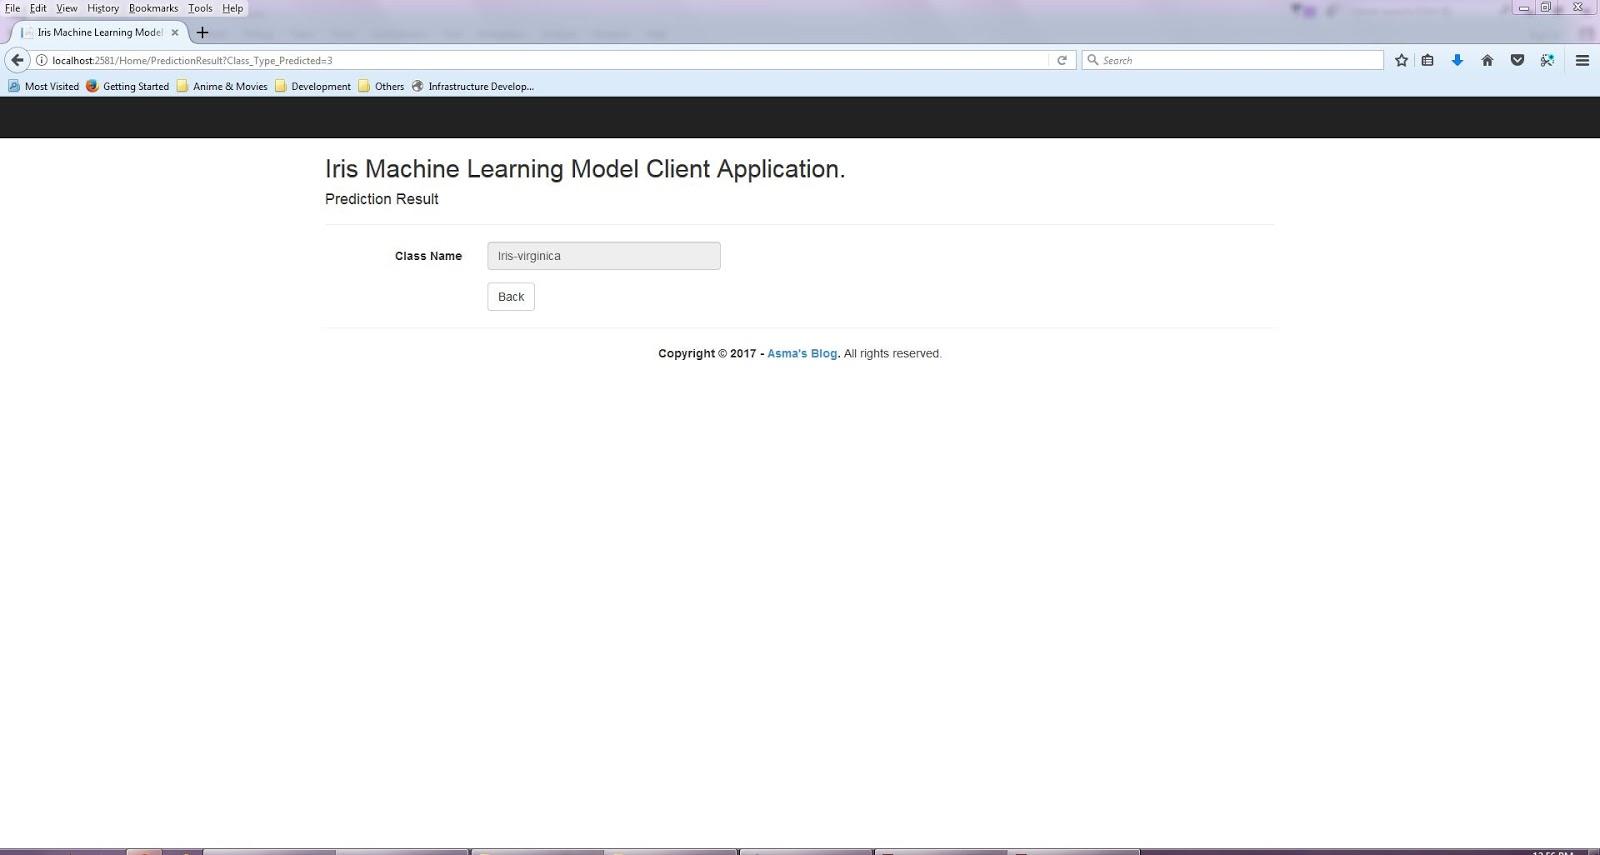 Azure Machine Learning: Iris Model Client Application